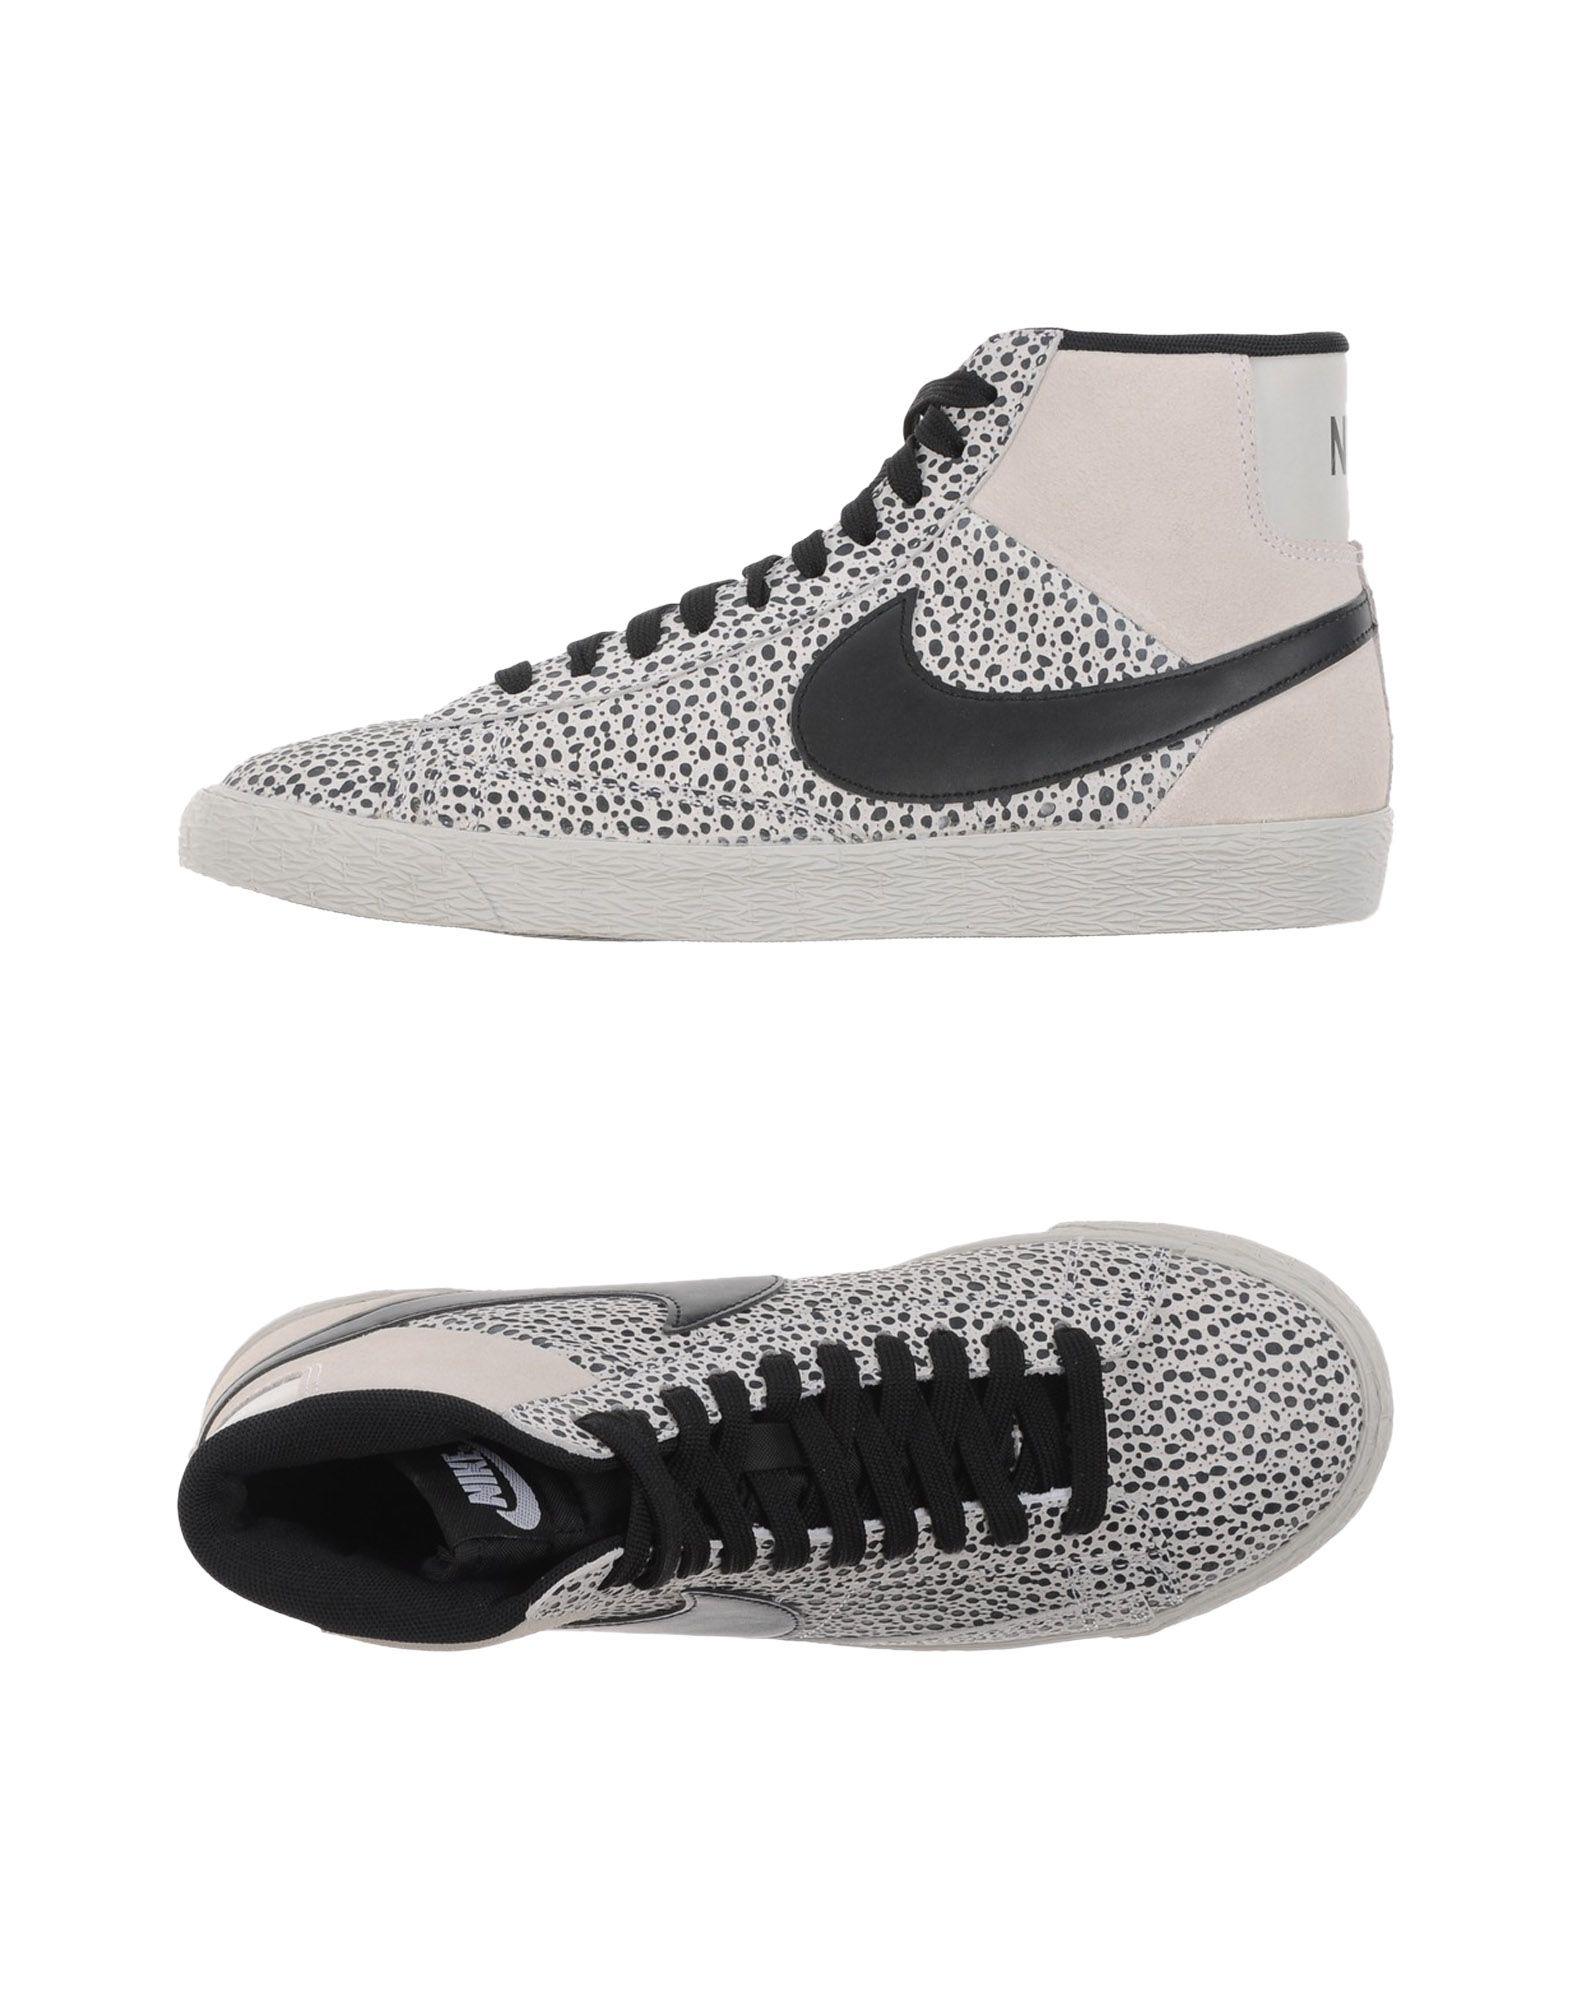 Nike Sneakers Damen  11178450PQ 11178450PQ 11178450PQ Gute Qualität beliebte Schuhe badb1d